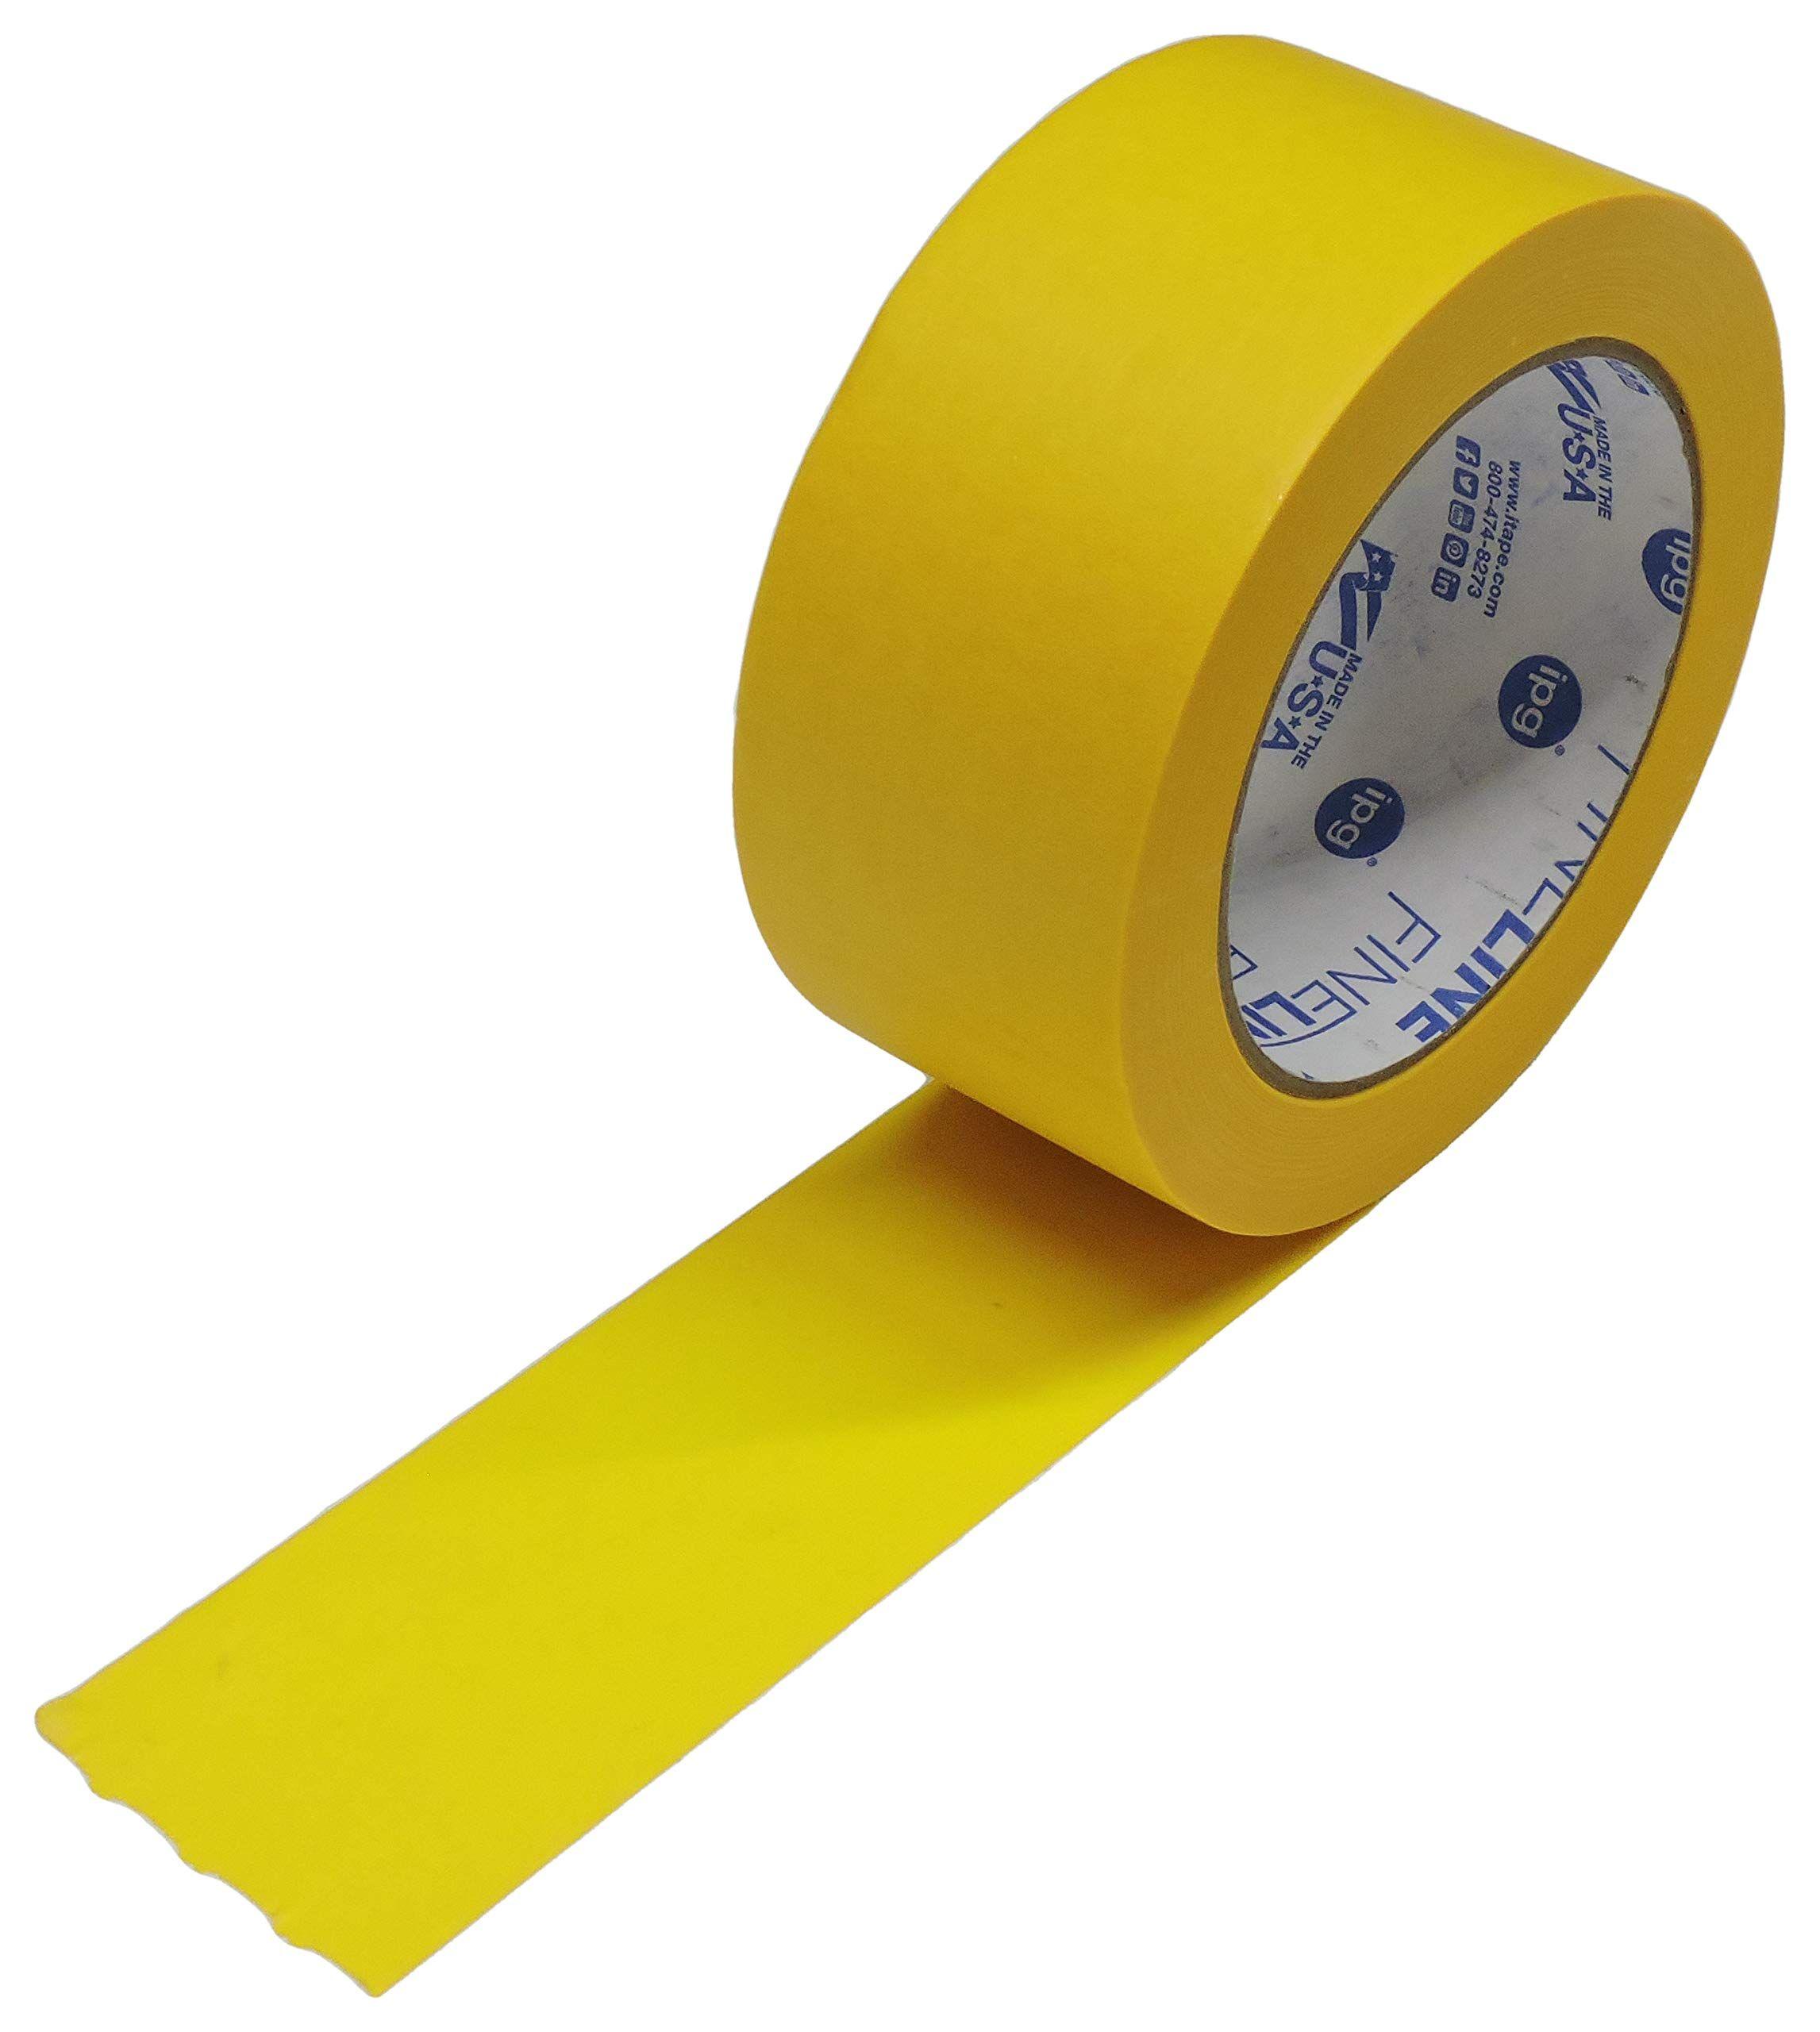 Ipg Fineline 2 X 60yd Precision Mask Yellow Painters Masking Tape Razor Edge Pro Grade Cabinet Automotive Fine Edge Trim Tape Yo Masking Tape Adhesives Tape